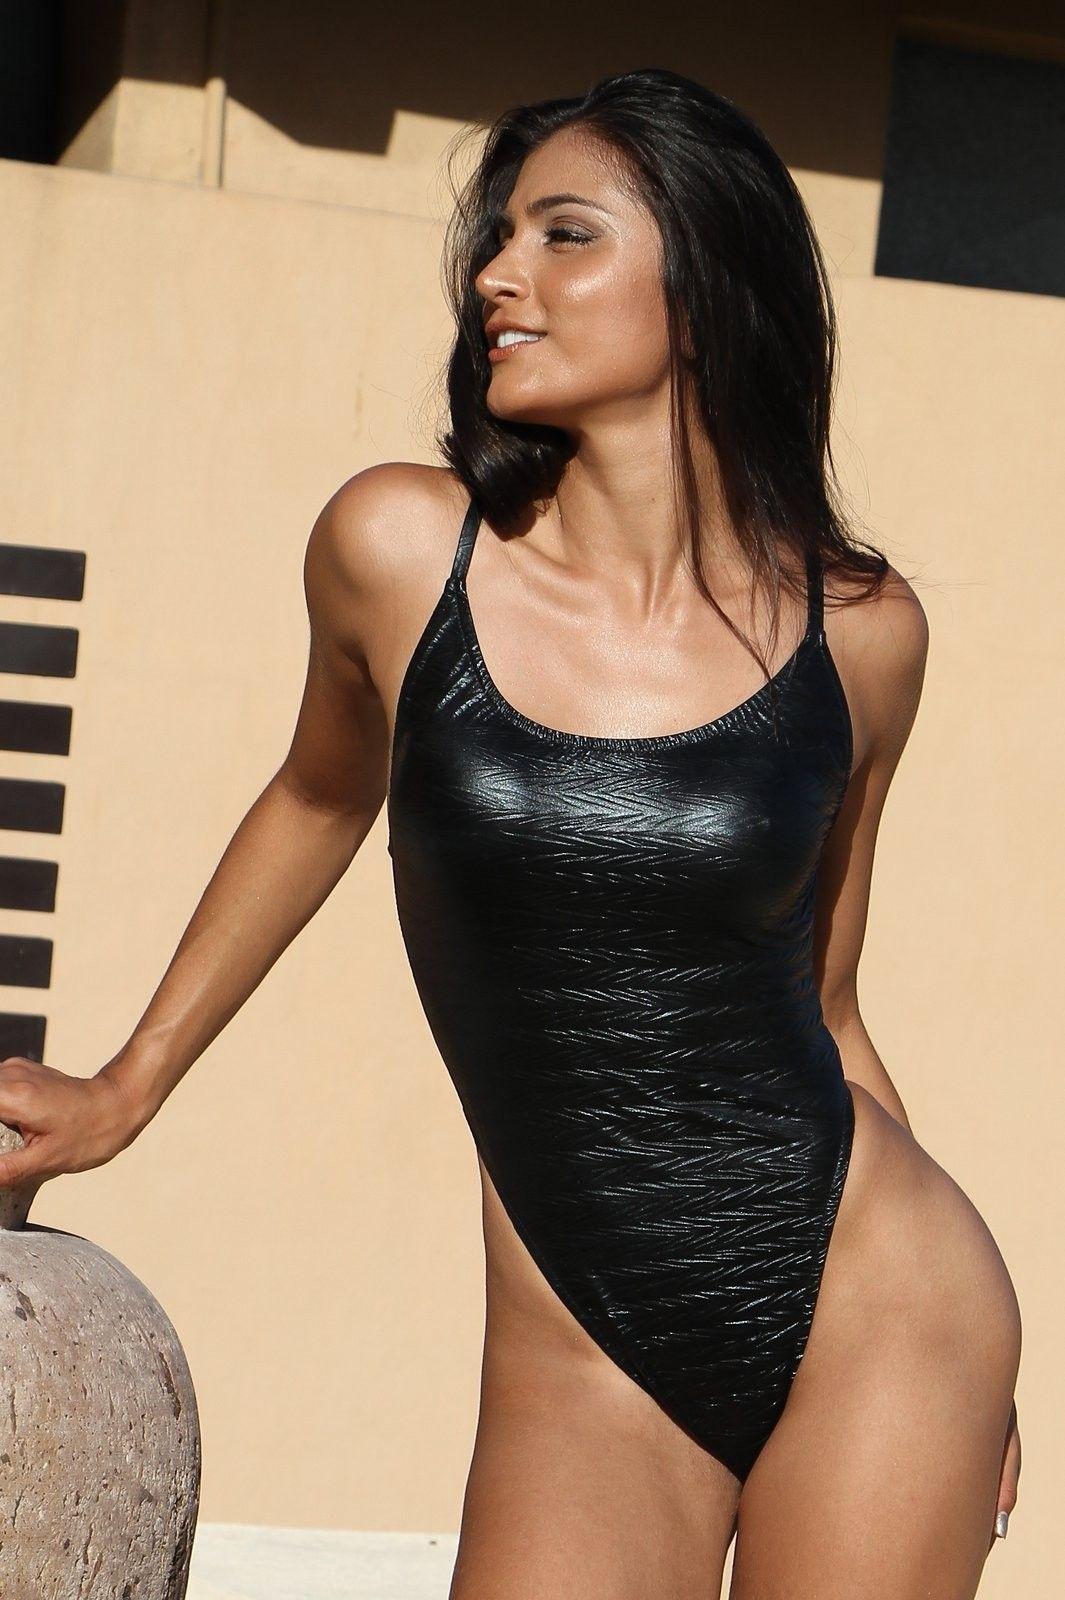 Sizzling Shiny Black One Piece Thong Bikini  http   www.tropicalbeachfashion.com 21909726def6